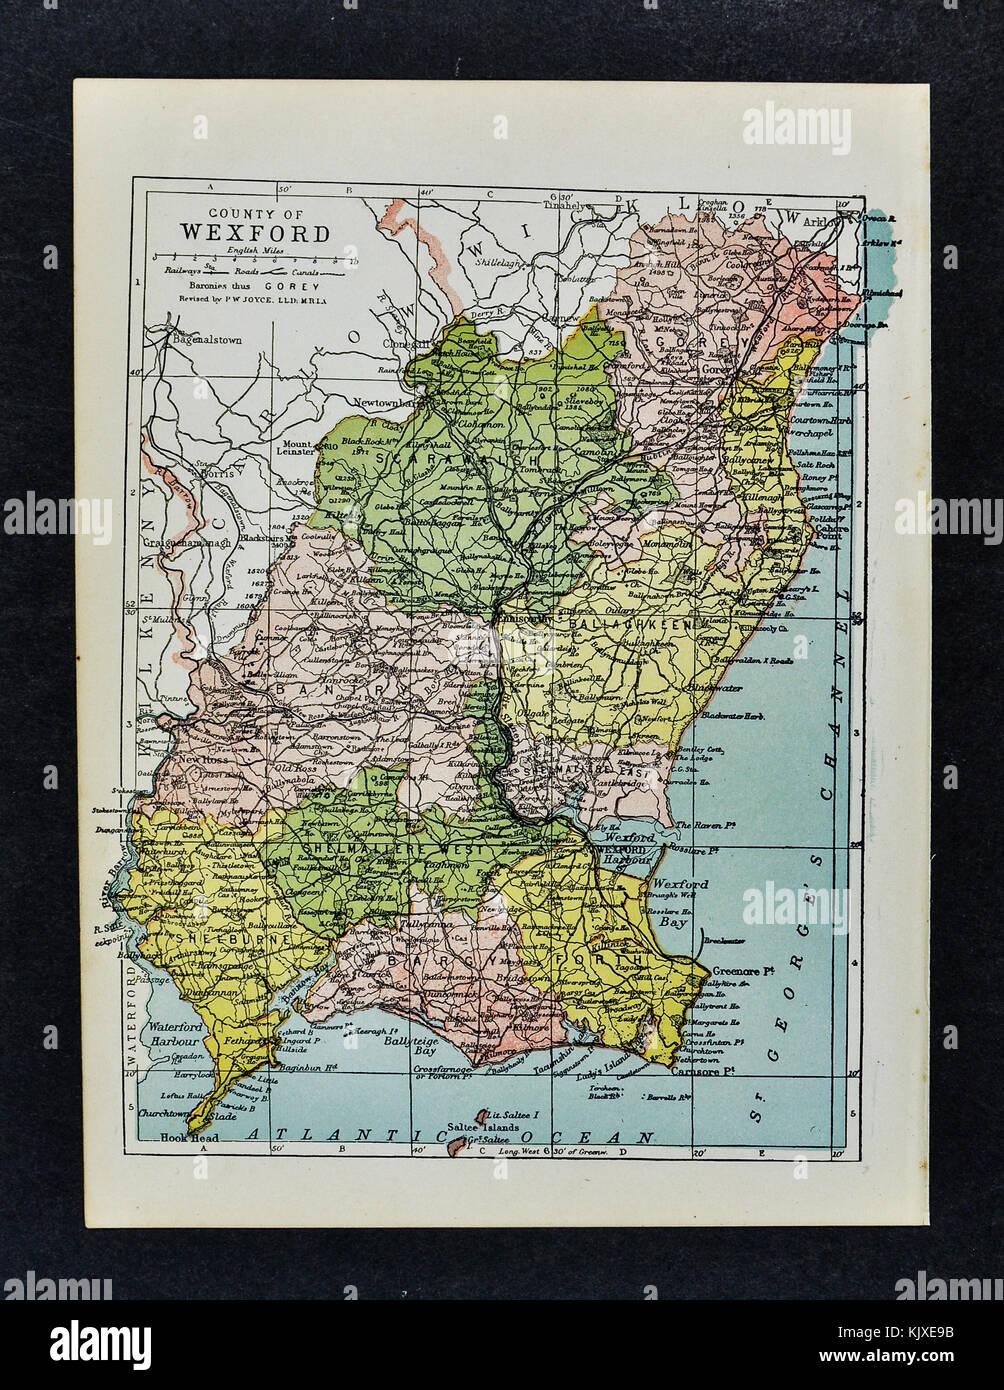 Wexford Map Of Ireland.Antique Ireland Map Wexford County Enniscorthy Newtonbarry Gorey